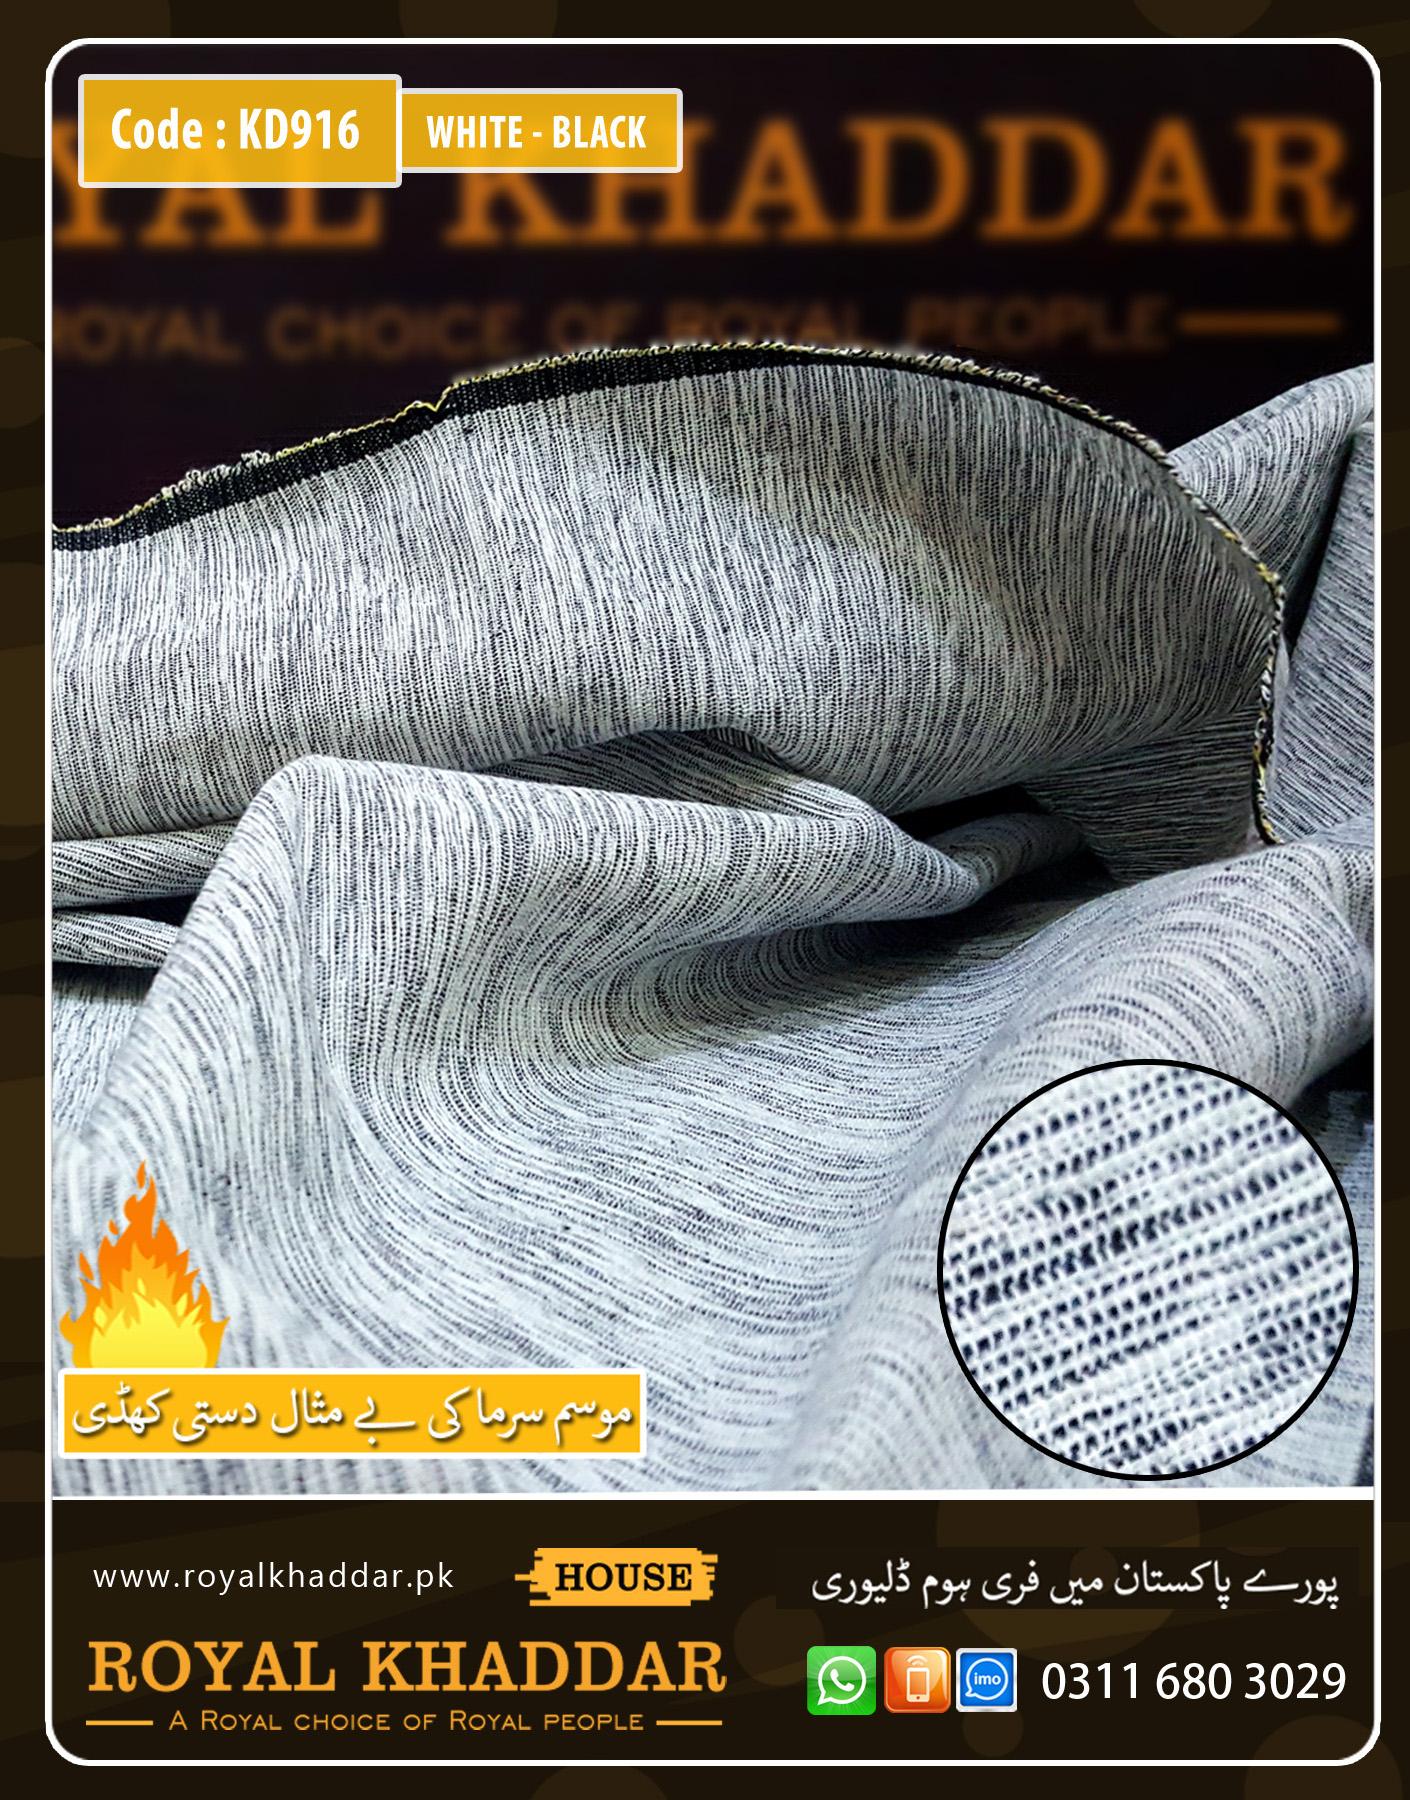 KD916 White - Black Handmade Khaddi